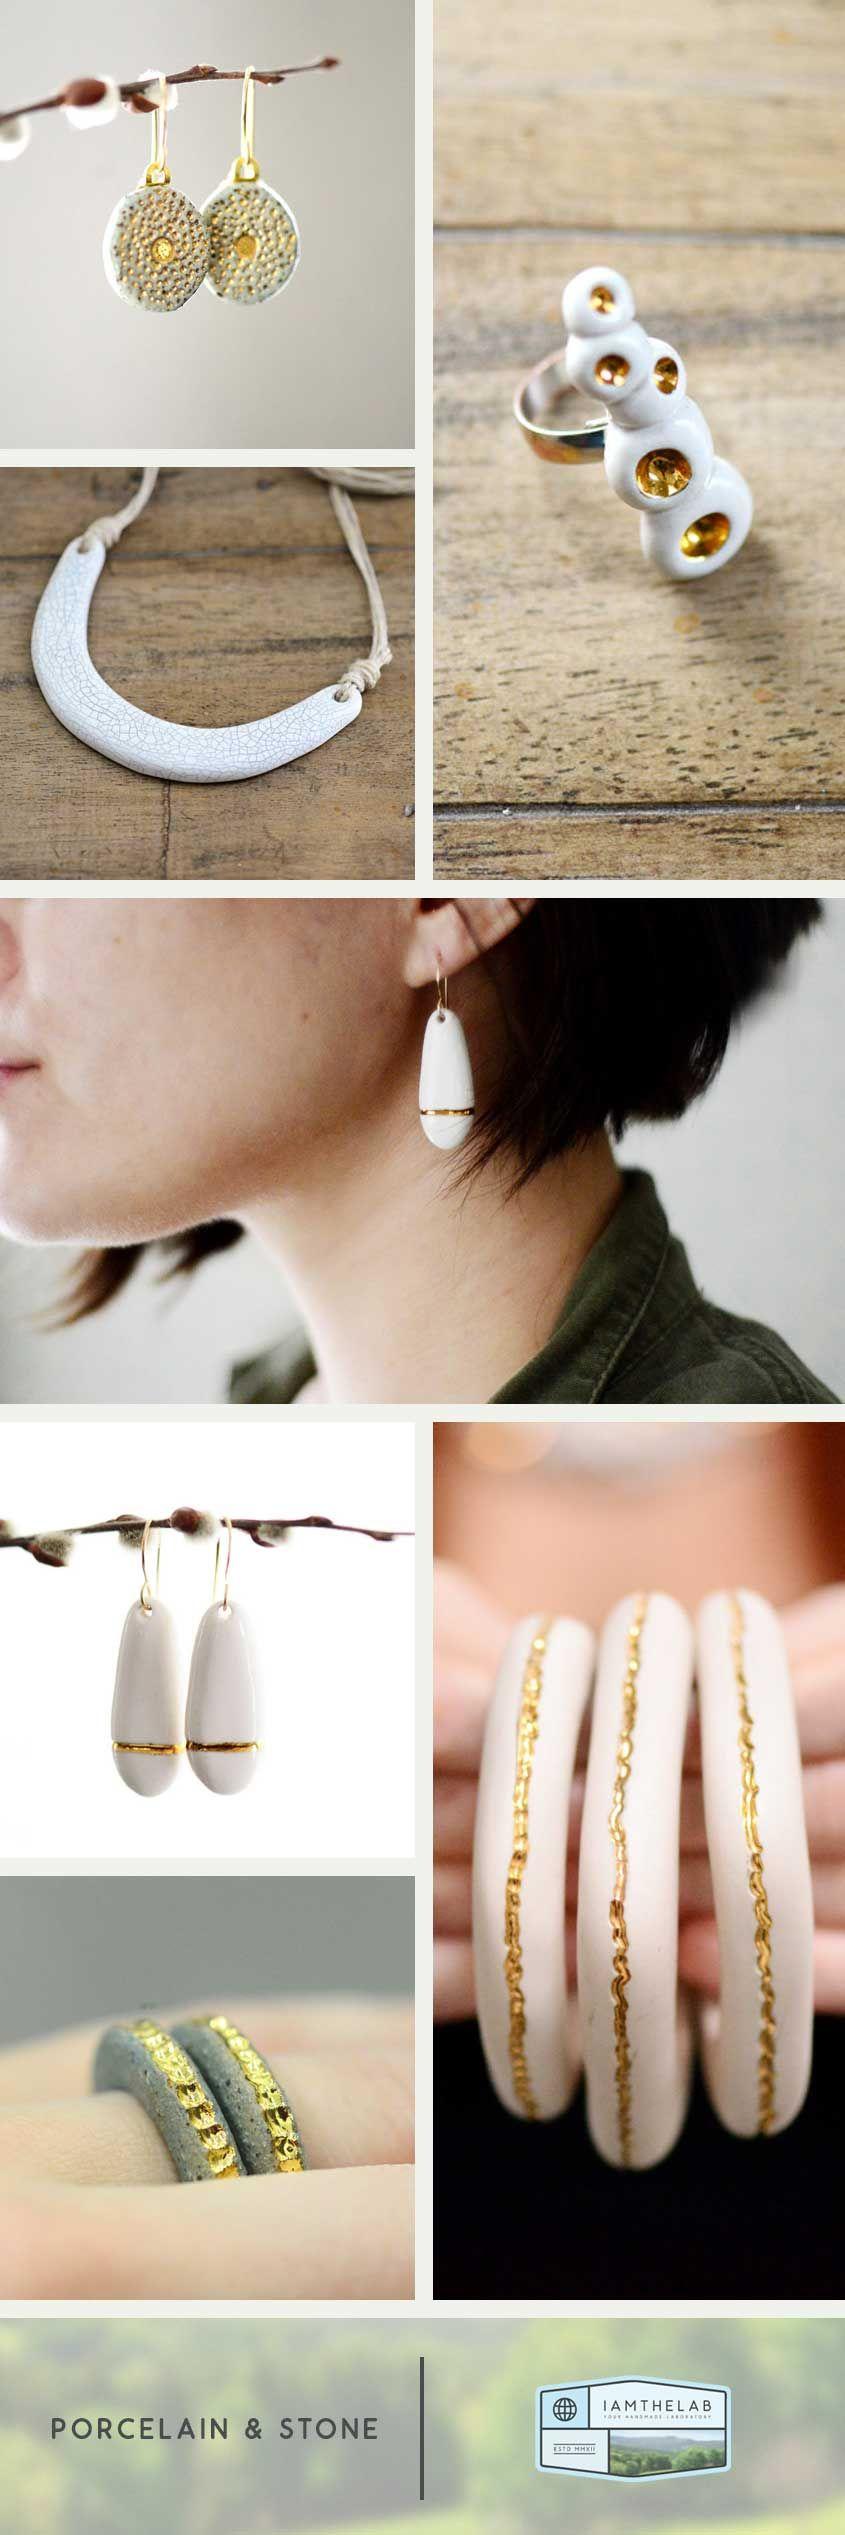 diy metallic knot stud earrings | oven bake clay, metallic spray